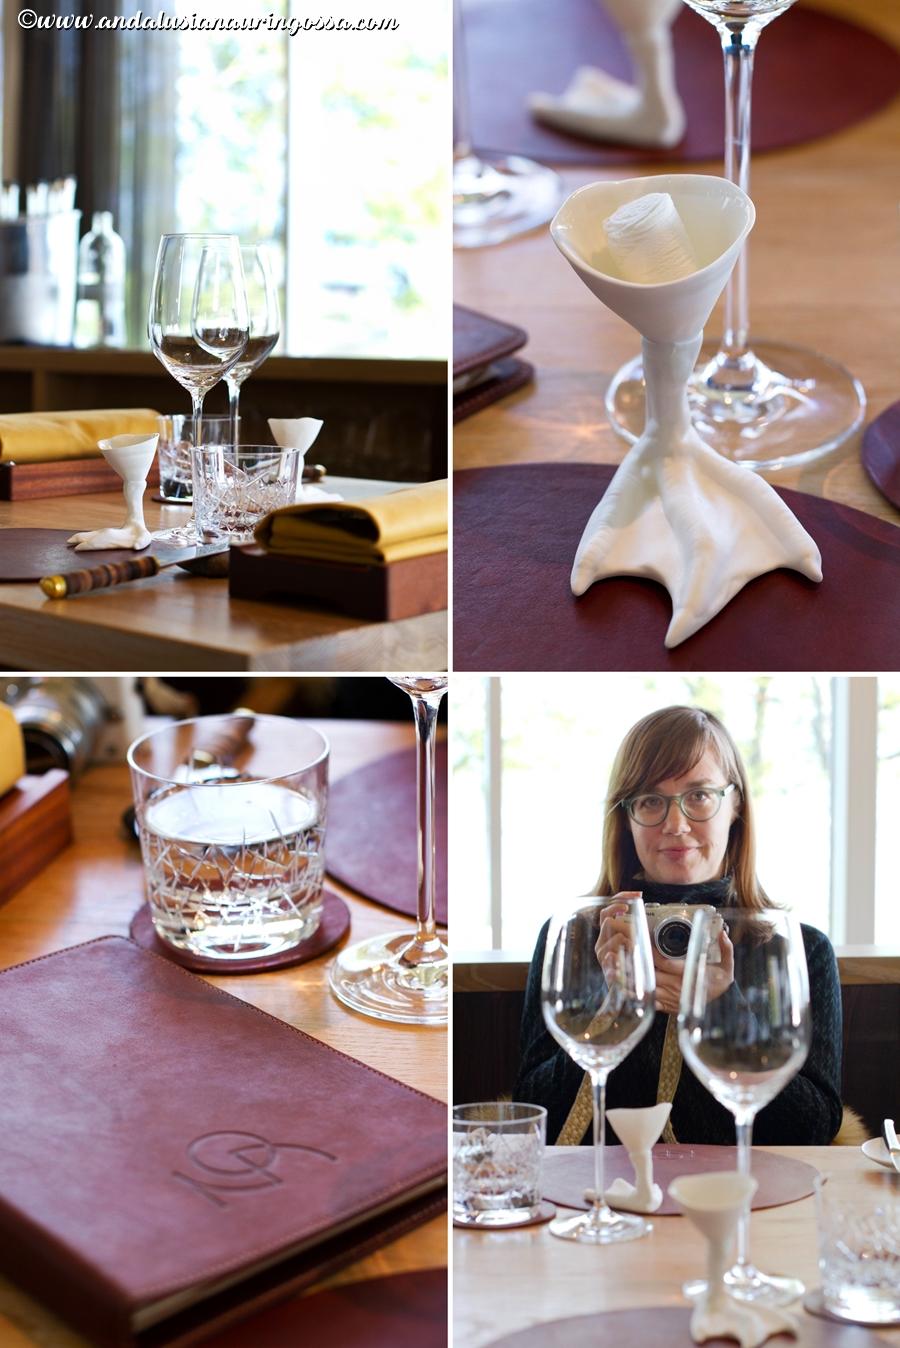 Restaurant Noa_Restoran Noa_Best restaurants in Tallinn_Andalusian Auringossa_foodblog_travelblog_3